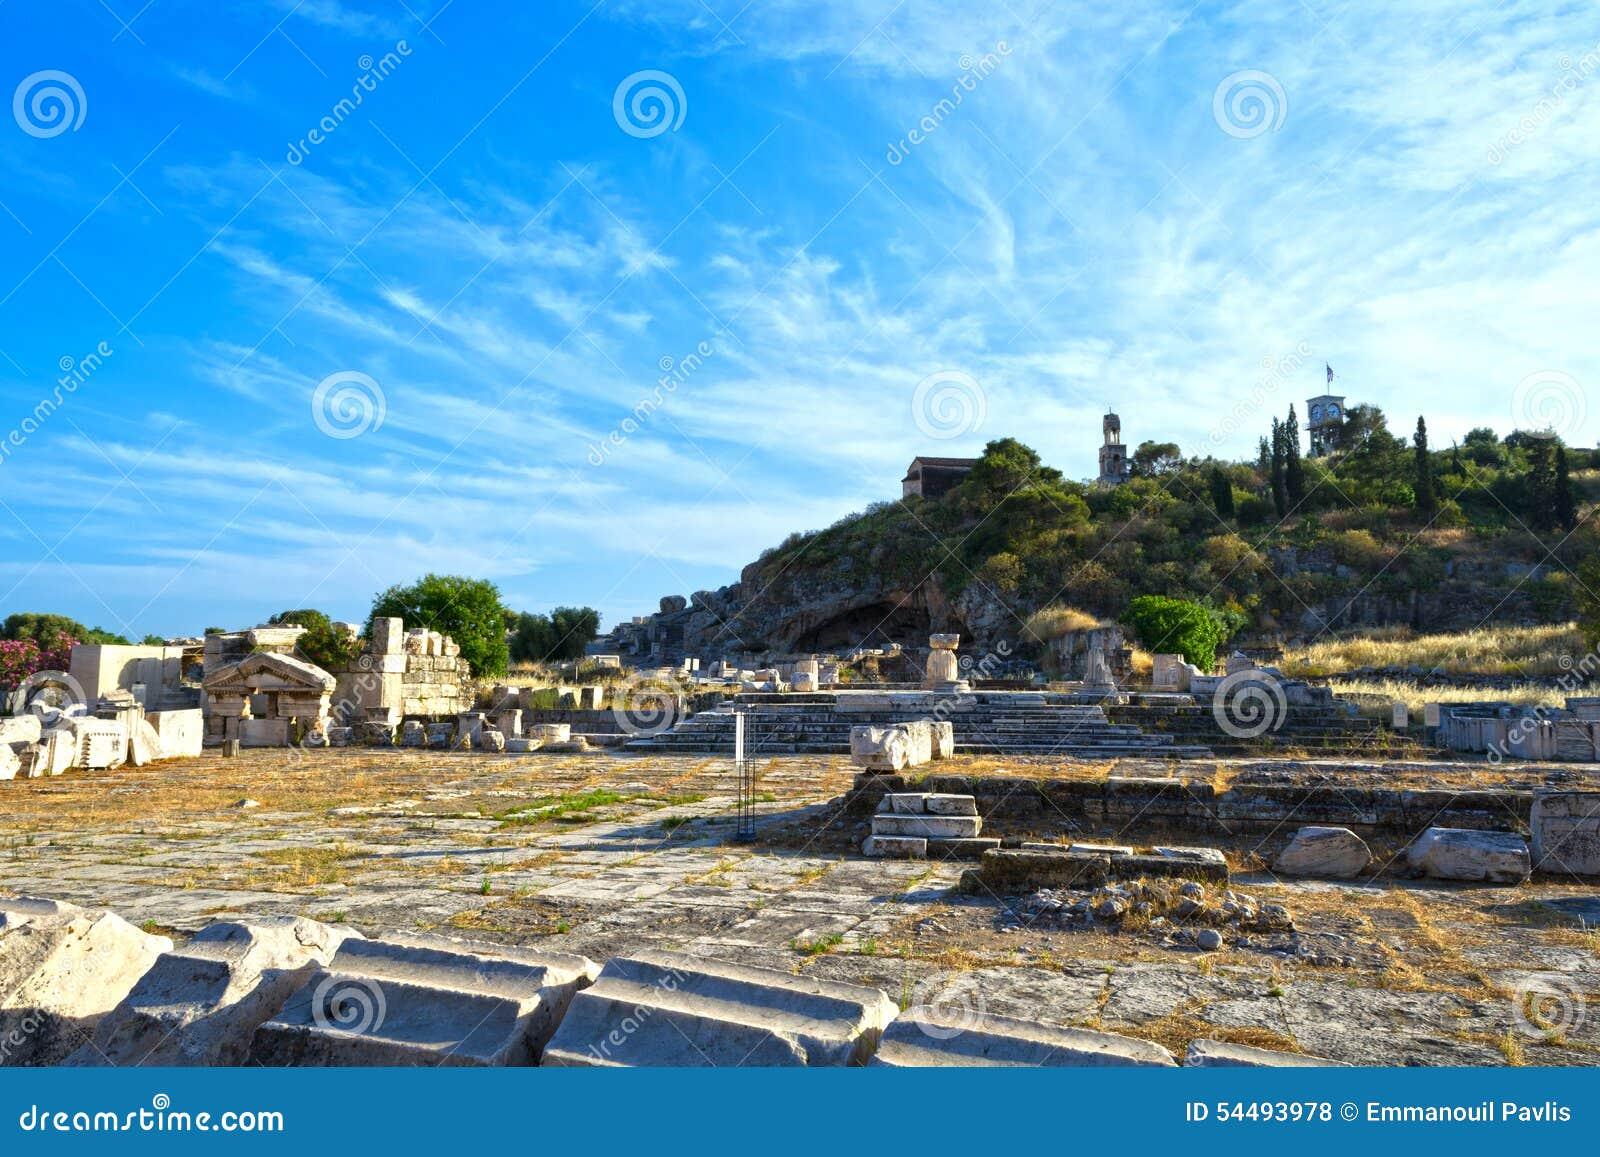 Ancient Eleusis Editorial Stock Photo - Image: 54493978